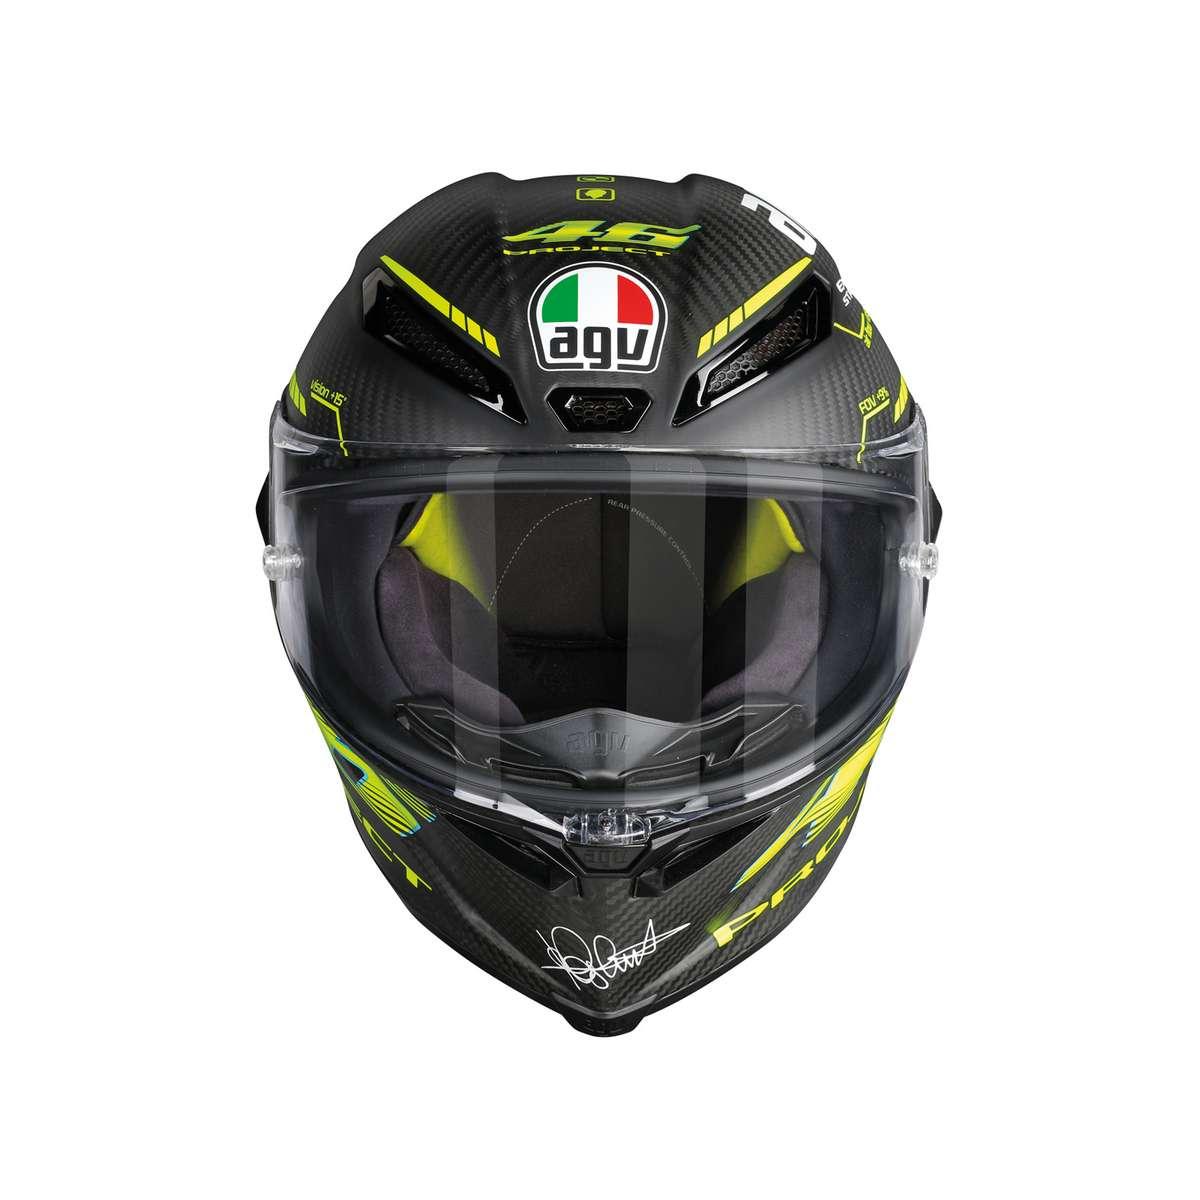 Agv Pista Gp R Top Project 46 2 0 Full Face Helmet